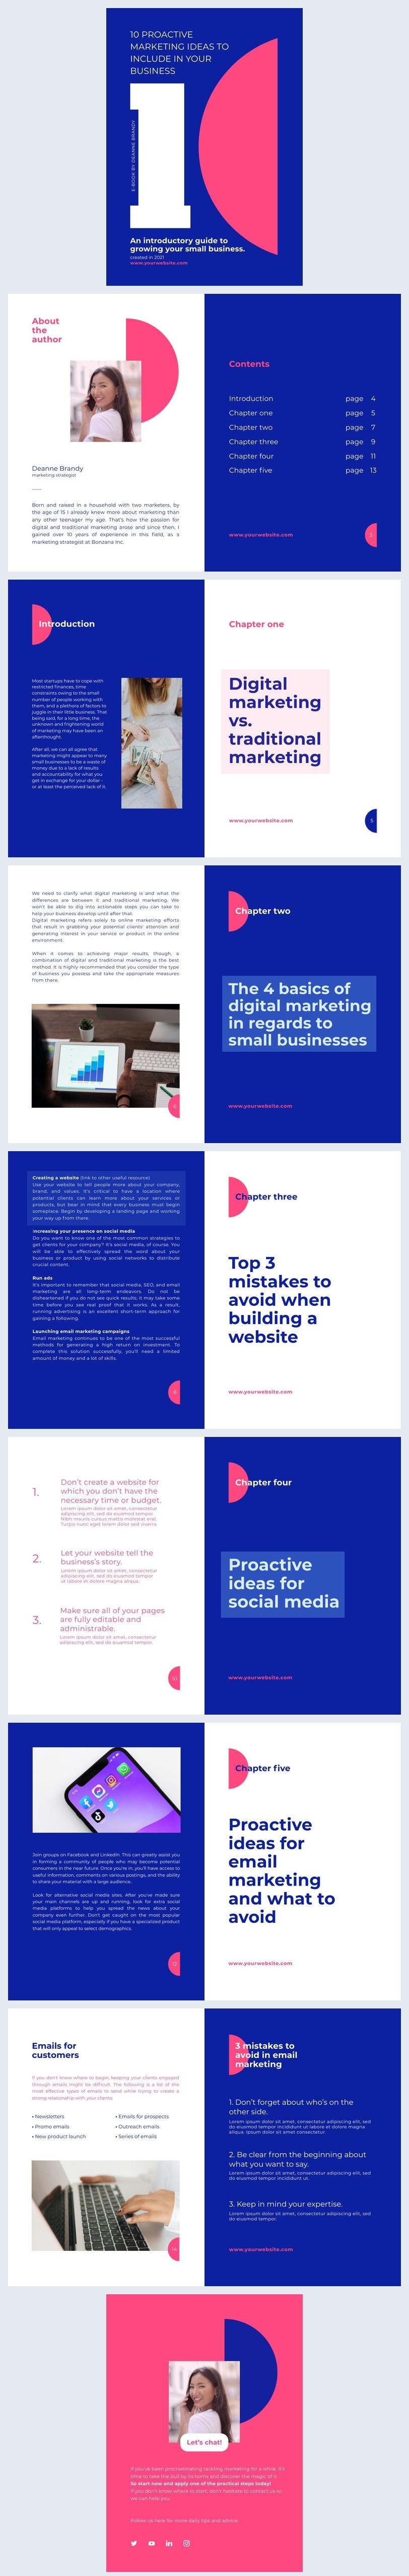 Exemple de design de ebooks de marketing interactif